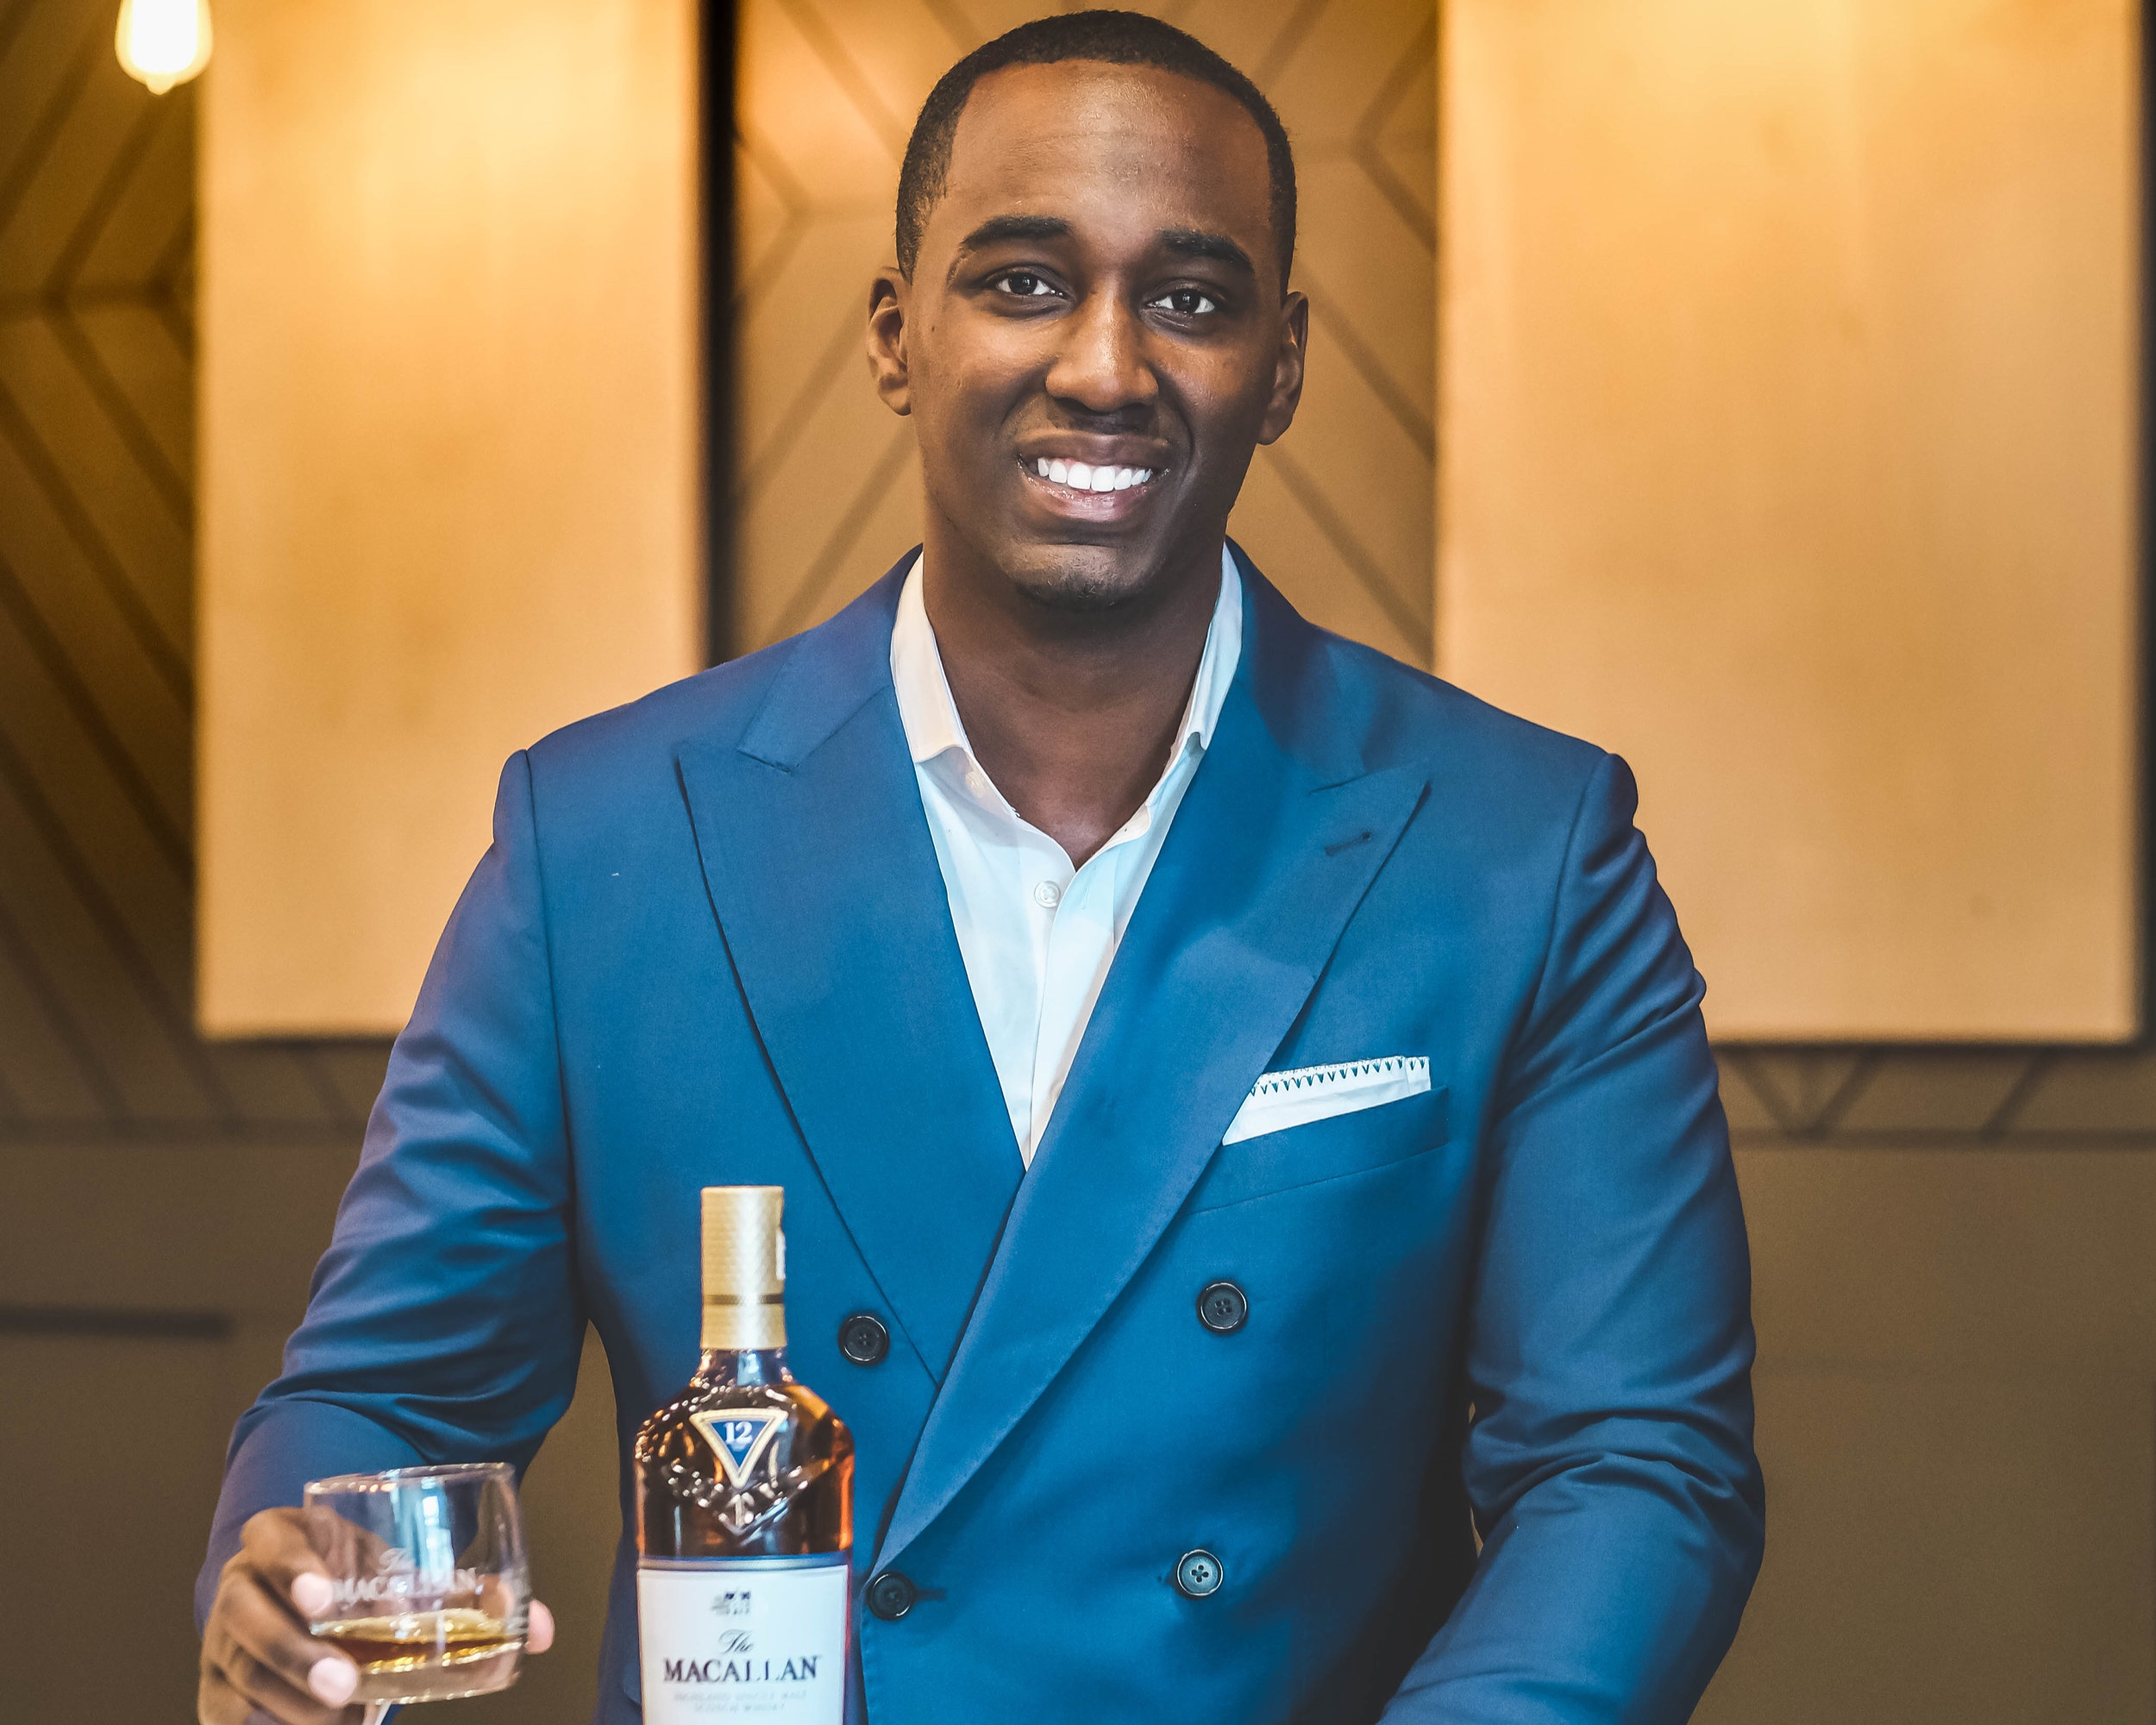 The Macallan Brand Ambassador - TPG is one of The Macallan Brand Ambassador based in Atlanta. #DrinkResponsibly